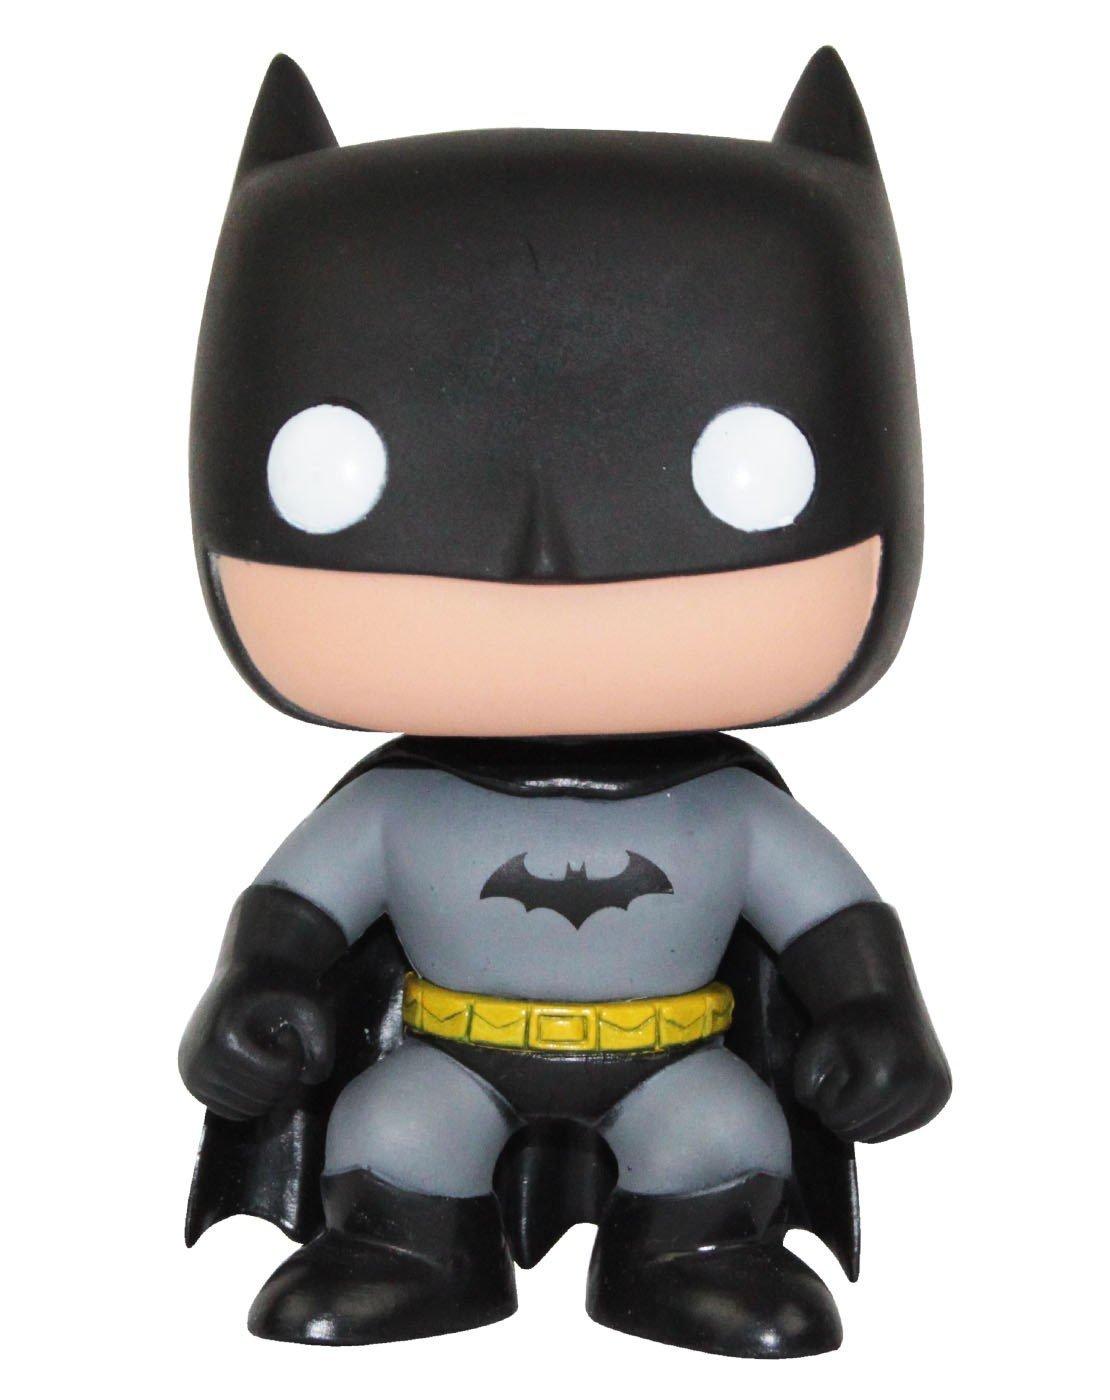 funko pop heroes dc comics batman vinyl action figure 2201 collectible toy ebay. Black Bedroom Furniture Sets. Home Design Ideas